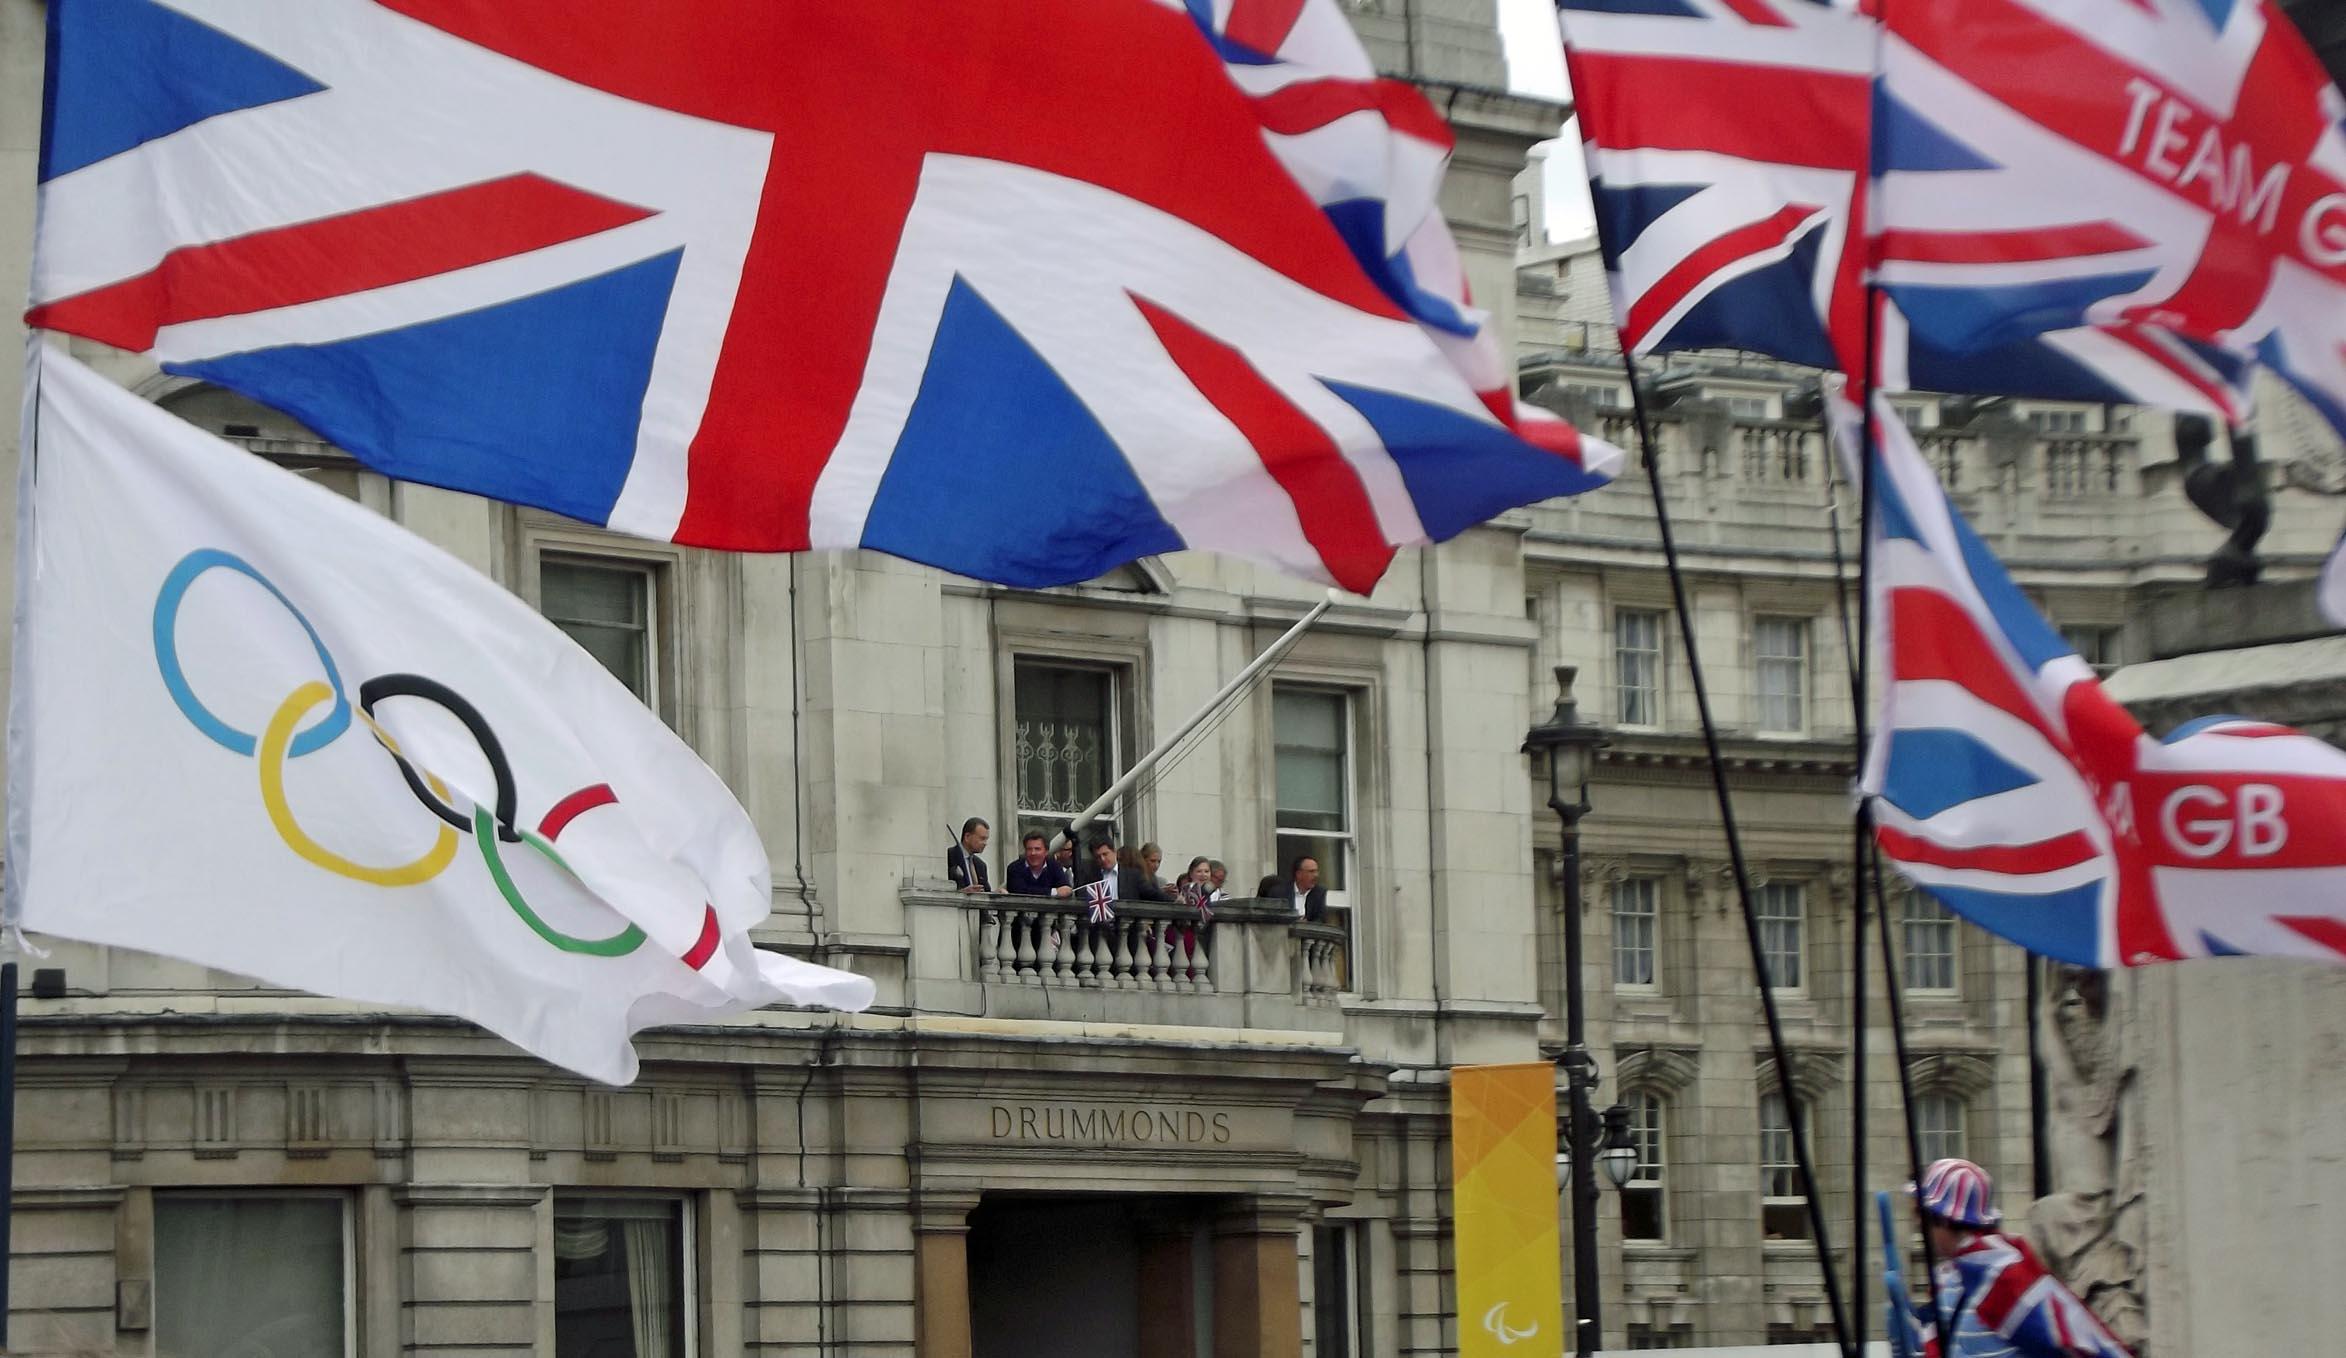 Crowd waving flags